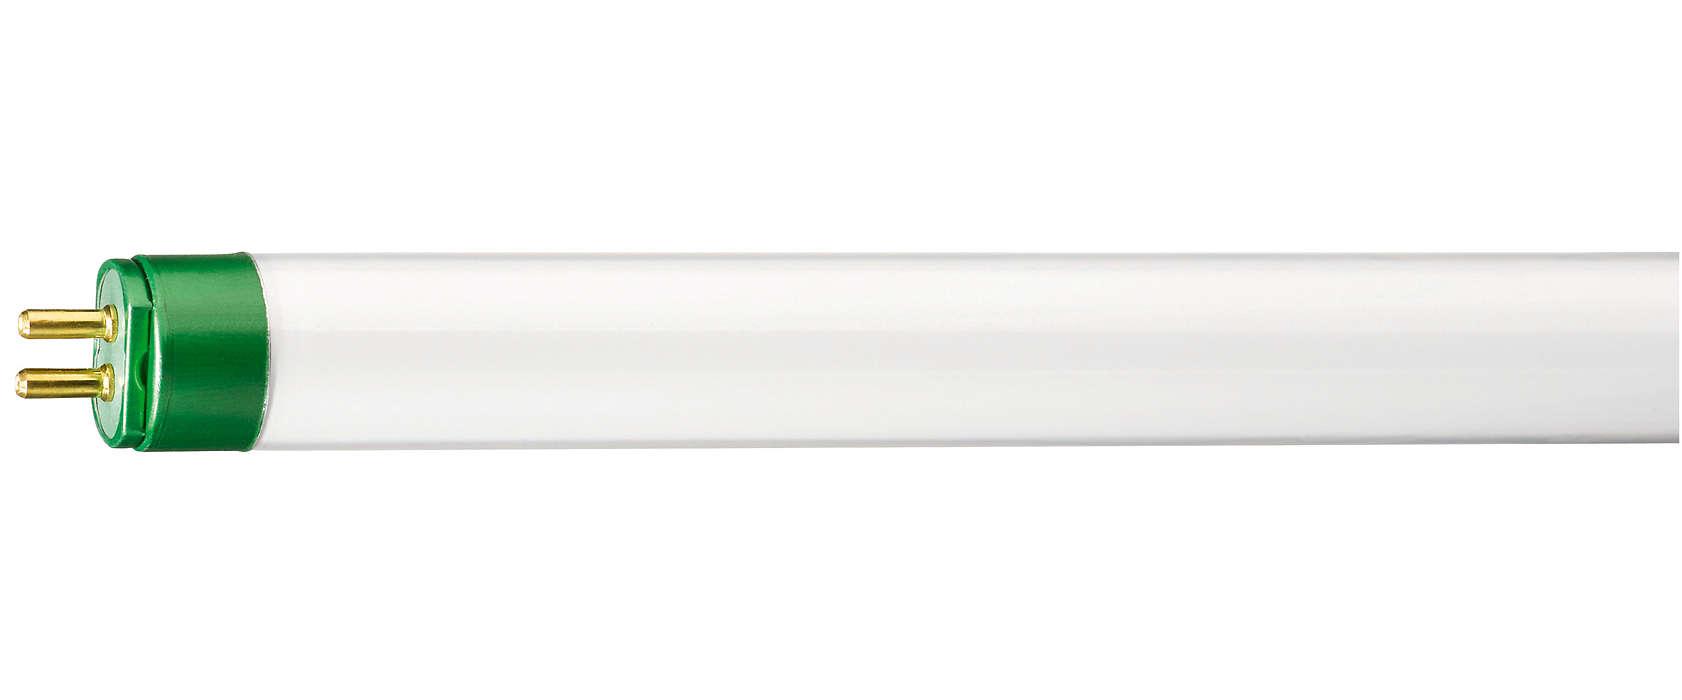 The world's most efficient fluorescent lighting